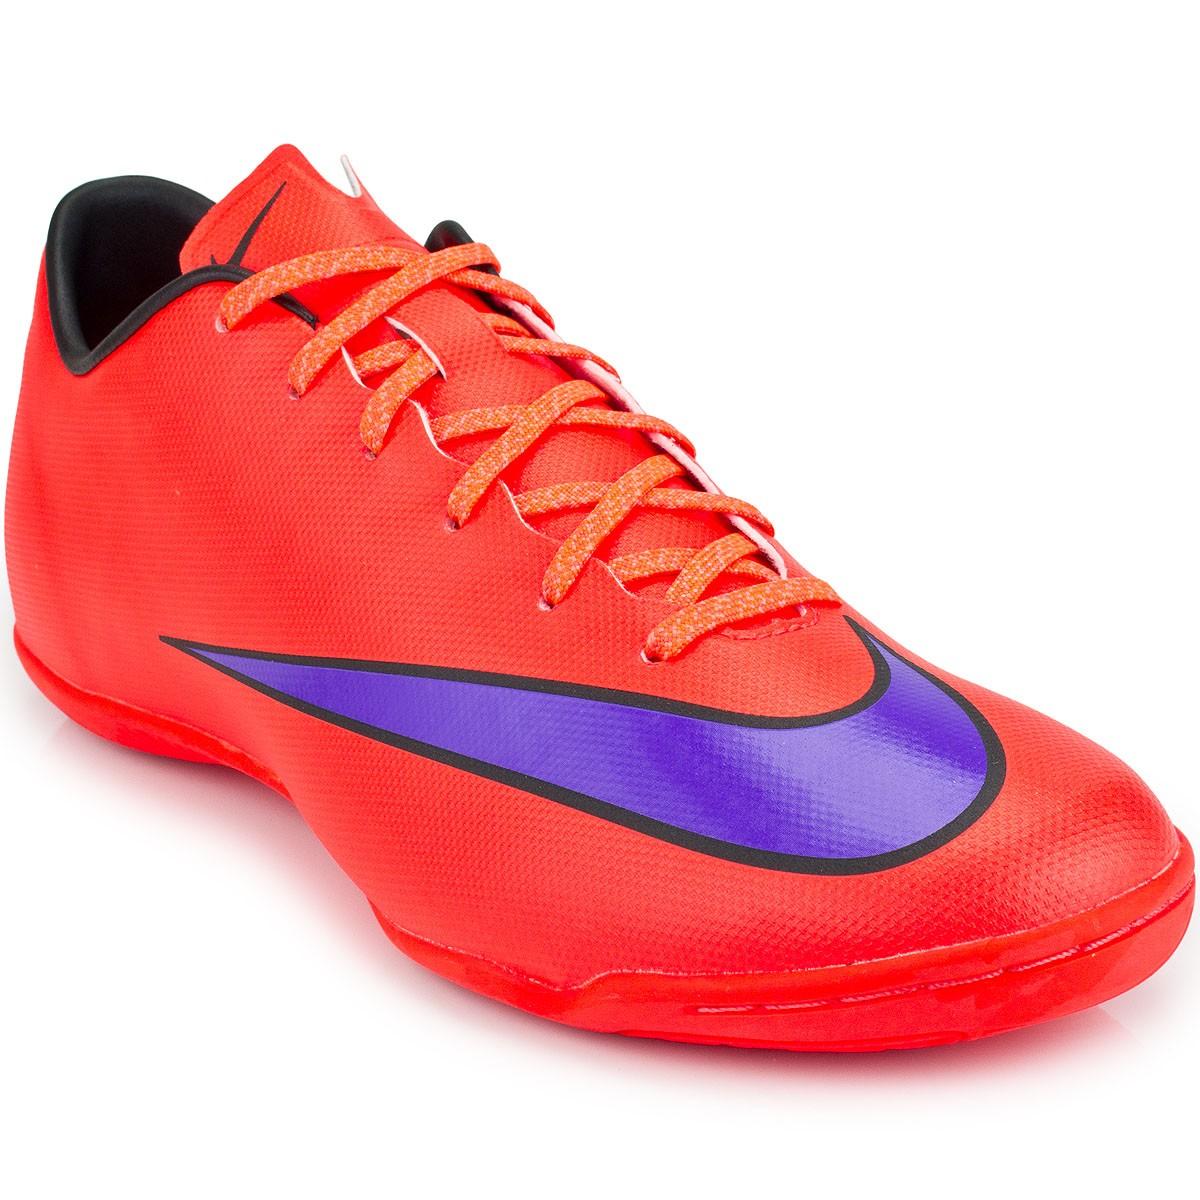 separation shoes 2fe3d 9a4c7 czech chuteira futsal nike mercurial x victory vi 761a2 9b7e5  new style chuteira  nike mercurial victory v ic 651635 b1085 80ec6